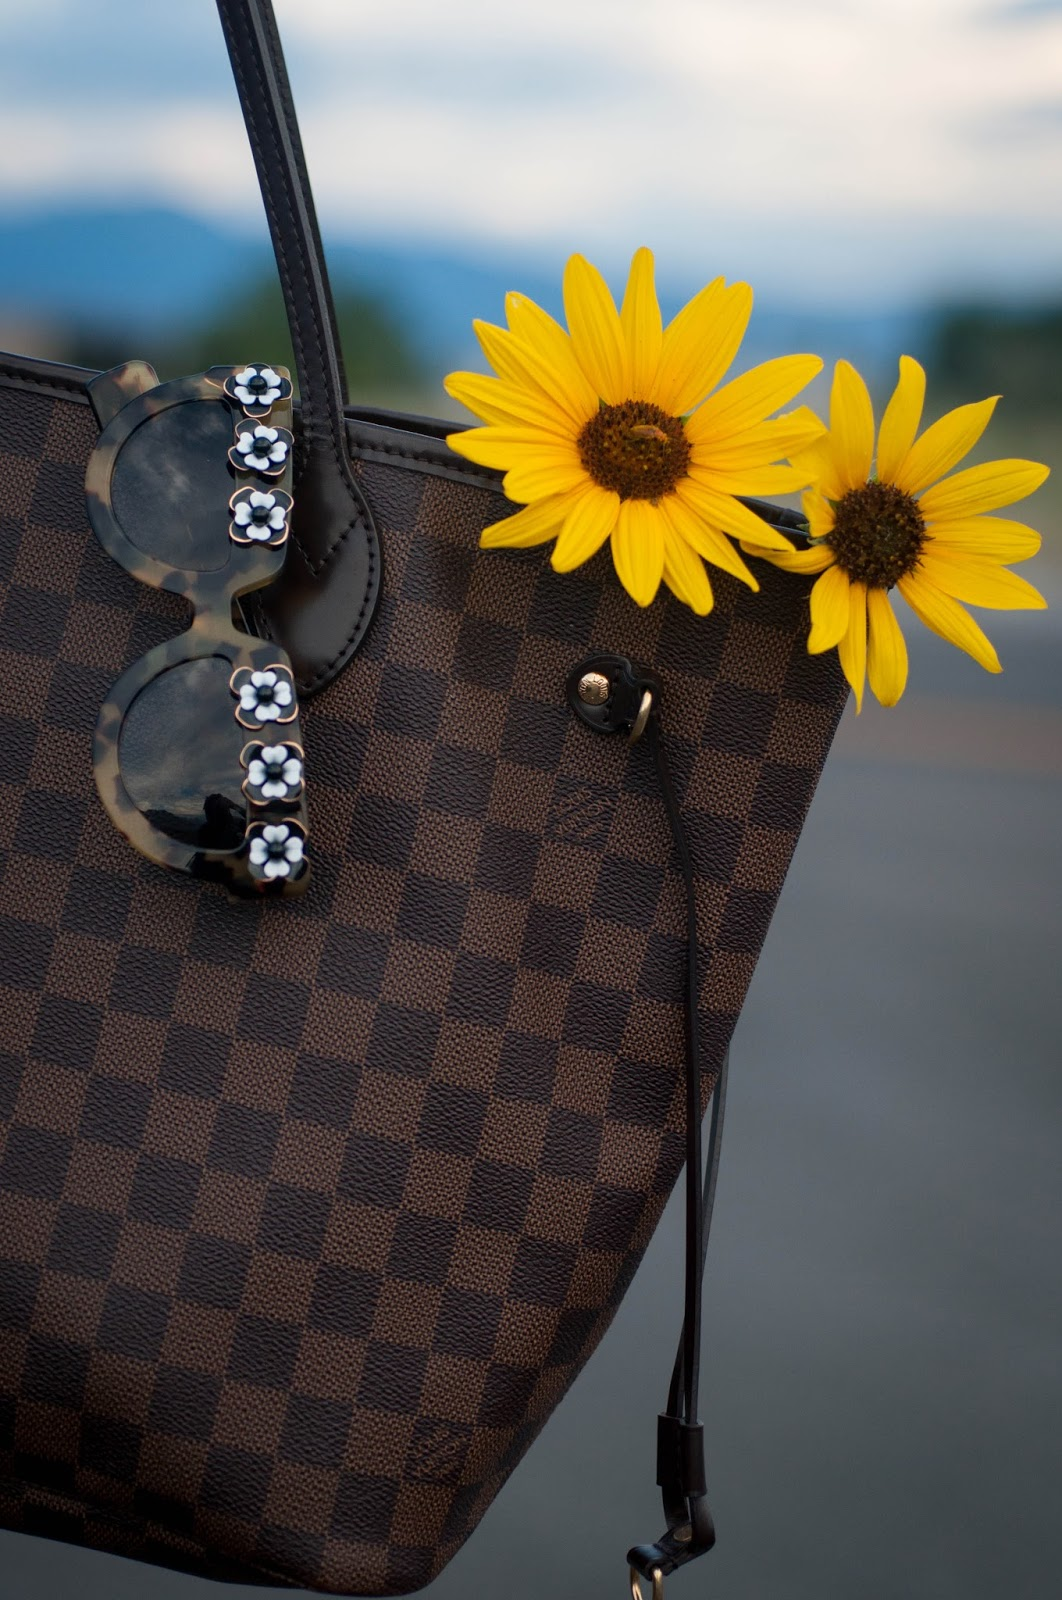 prada, prada sunglasses, prada 2013 flower sunglasses, louis vuitton damier, louis vuitton handbag, wildflowers